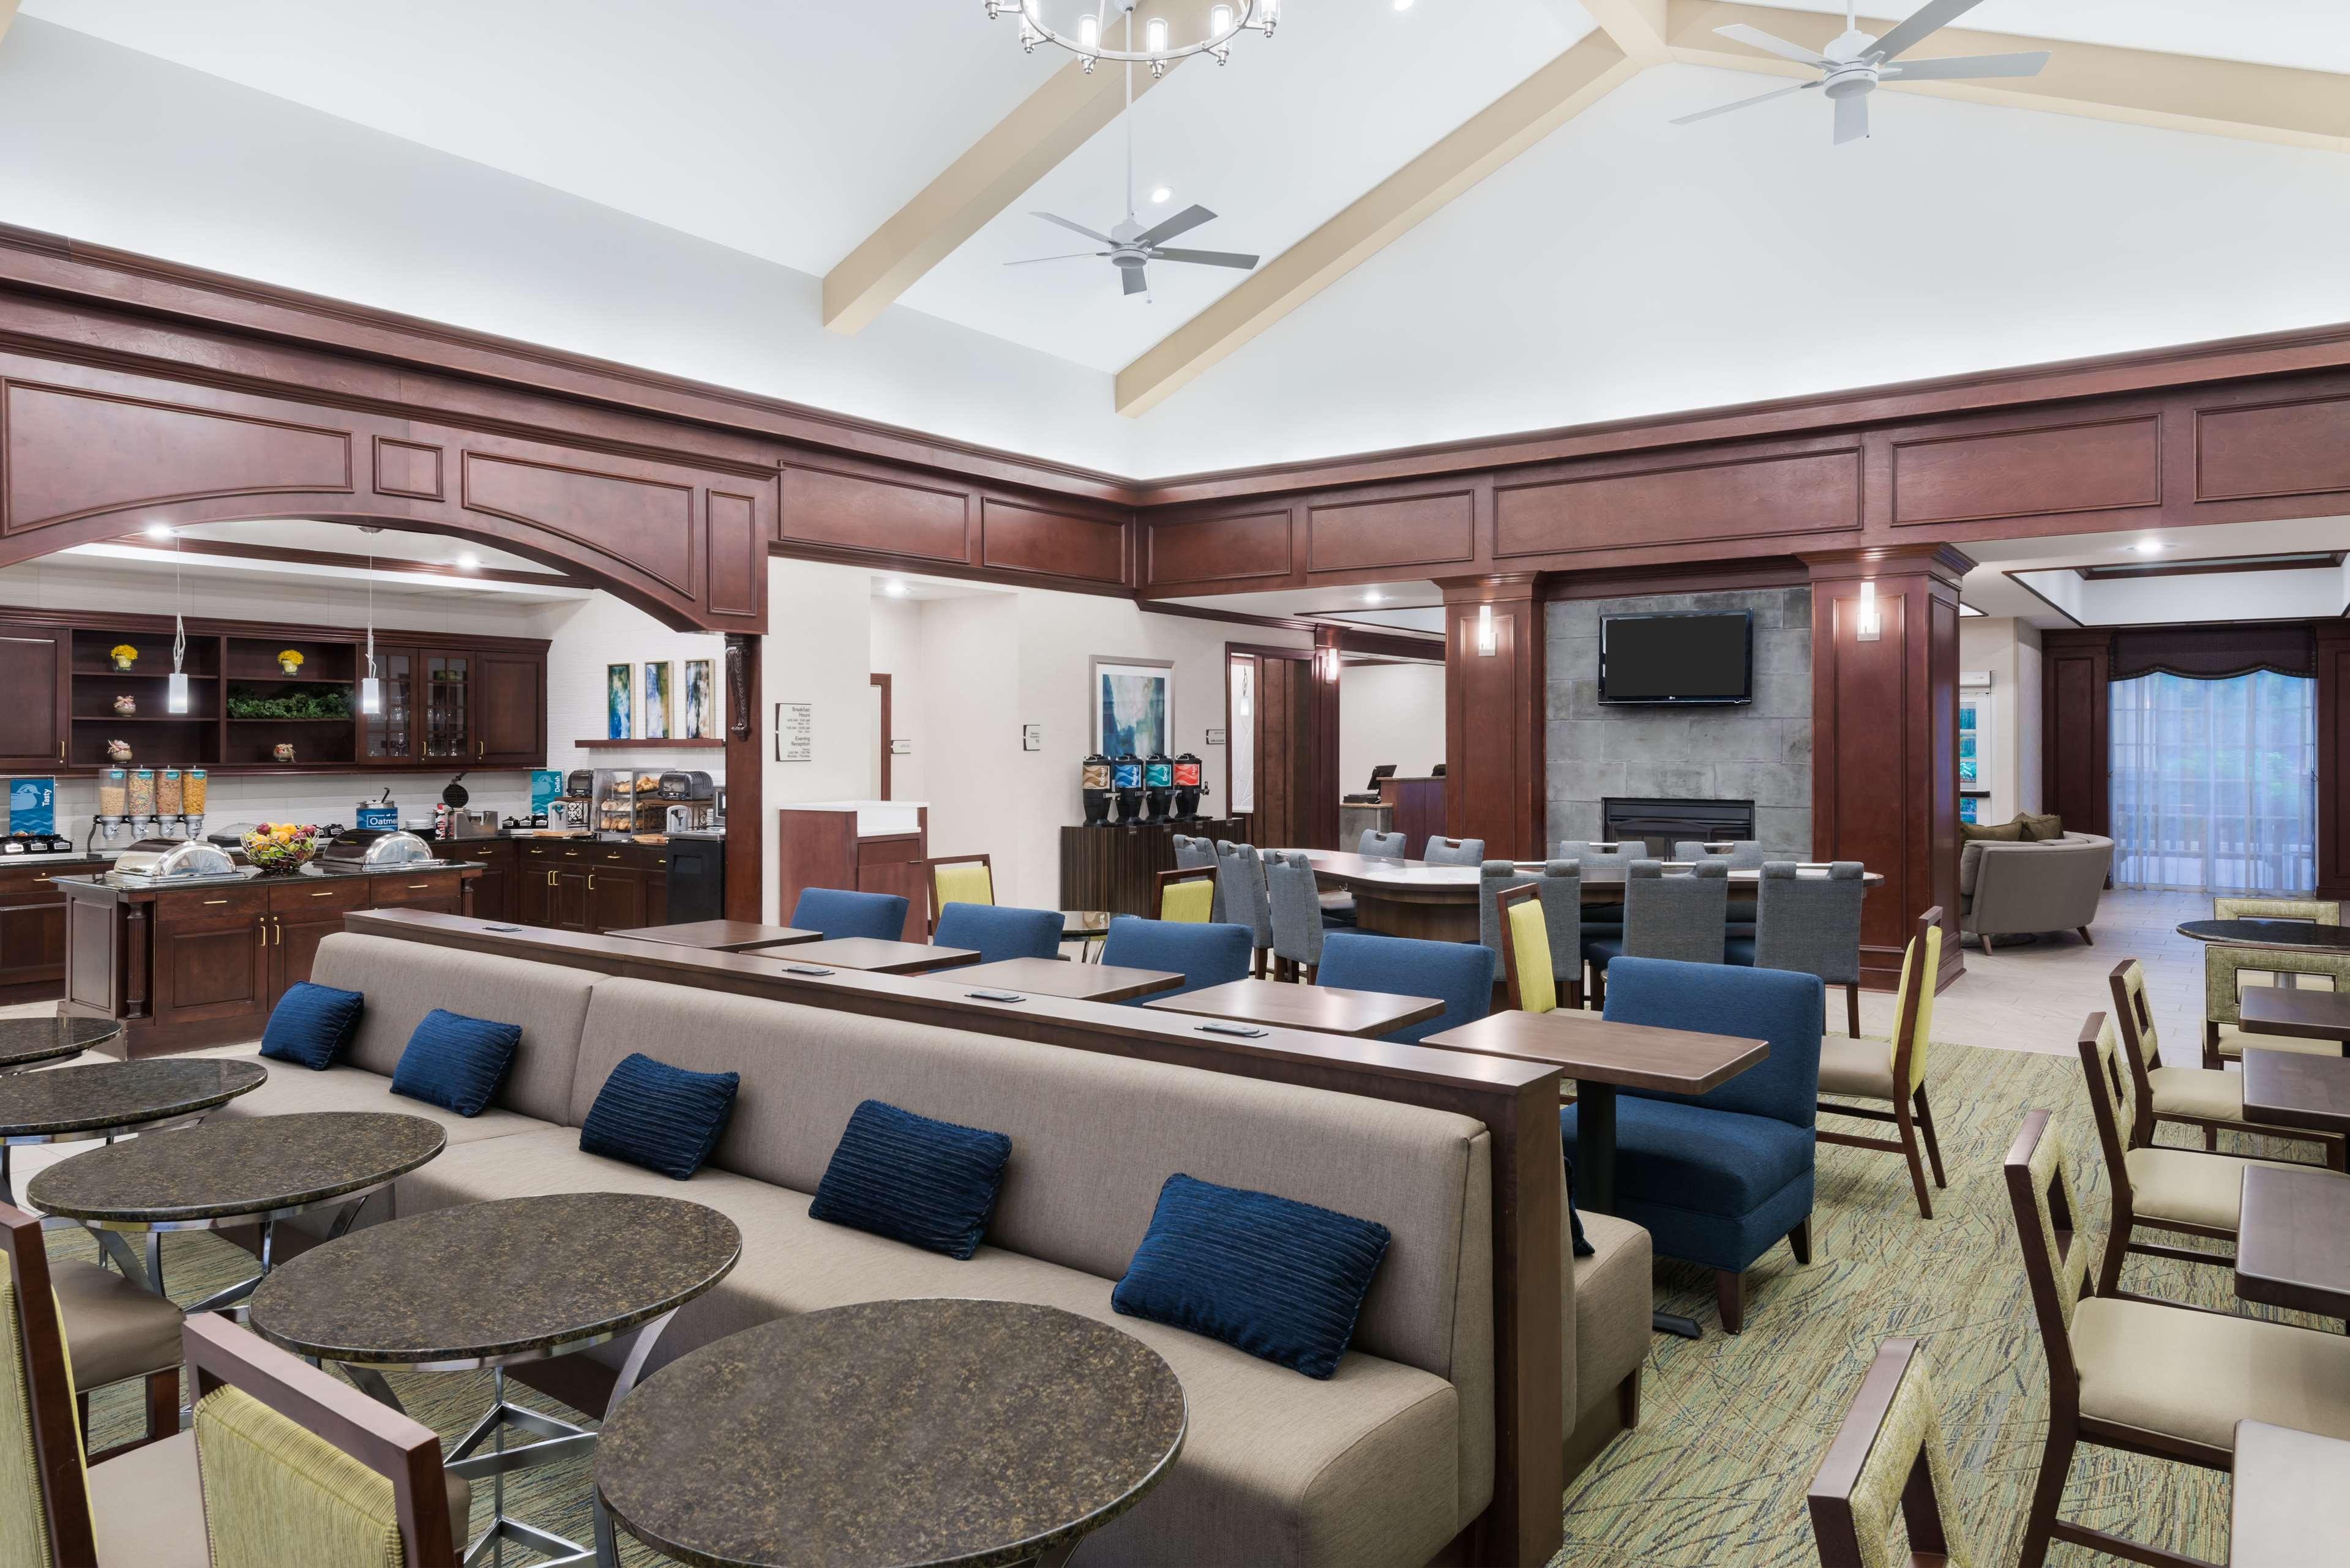 Homewood Suites by Hilton Holyoke-Springfield/North image 7